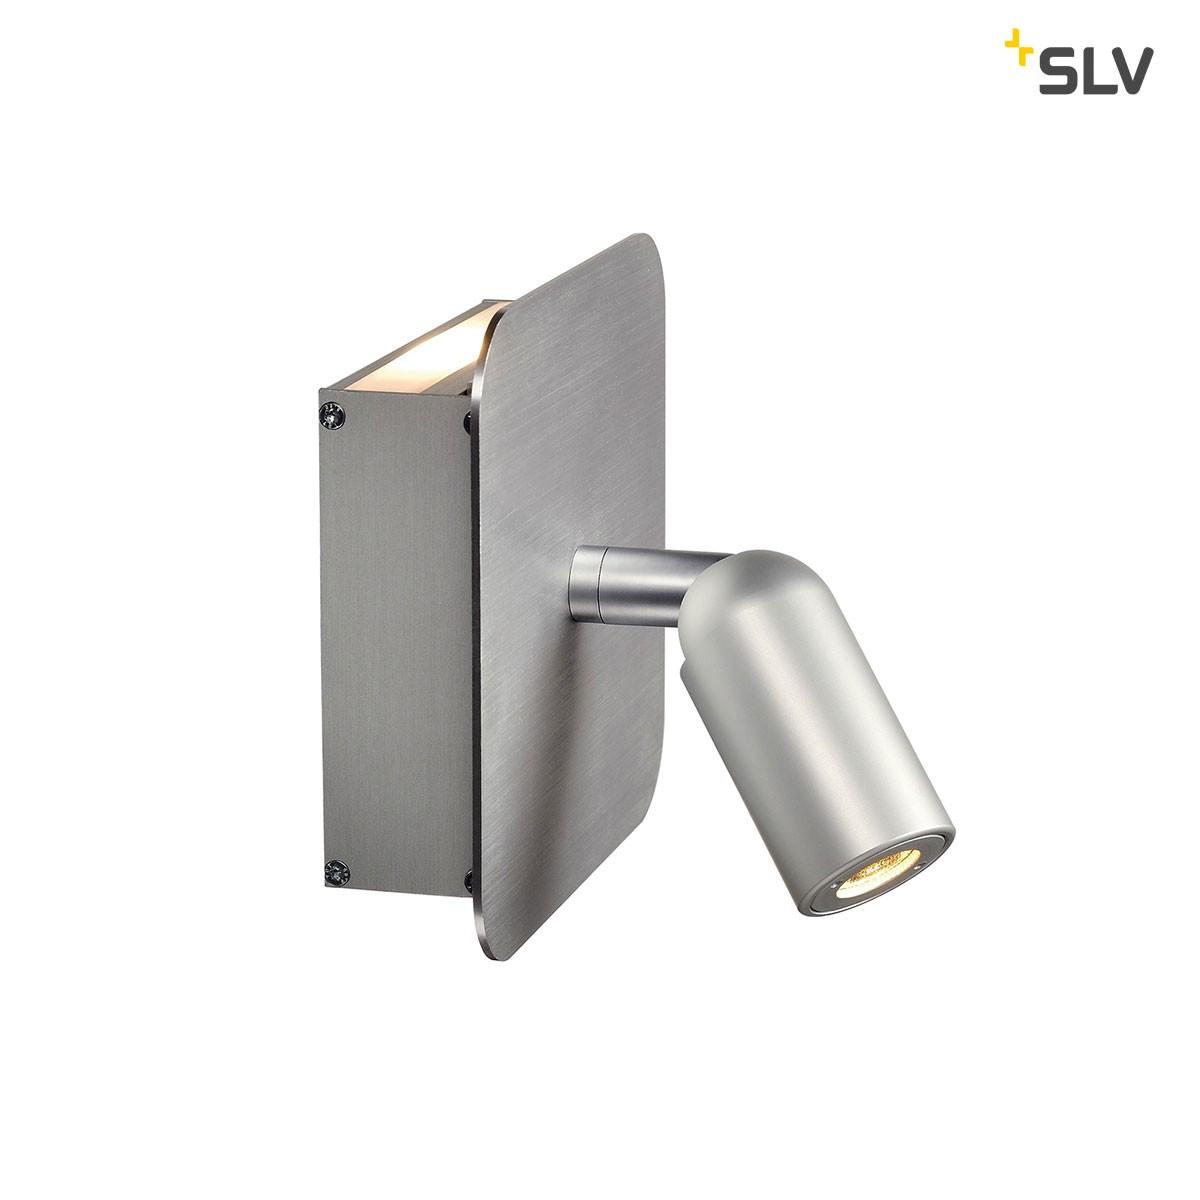 SLV Napia Wandleuchte, Aluminium gebürstet